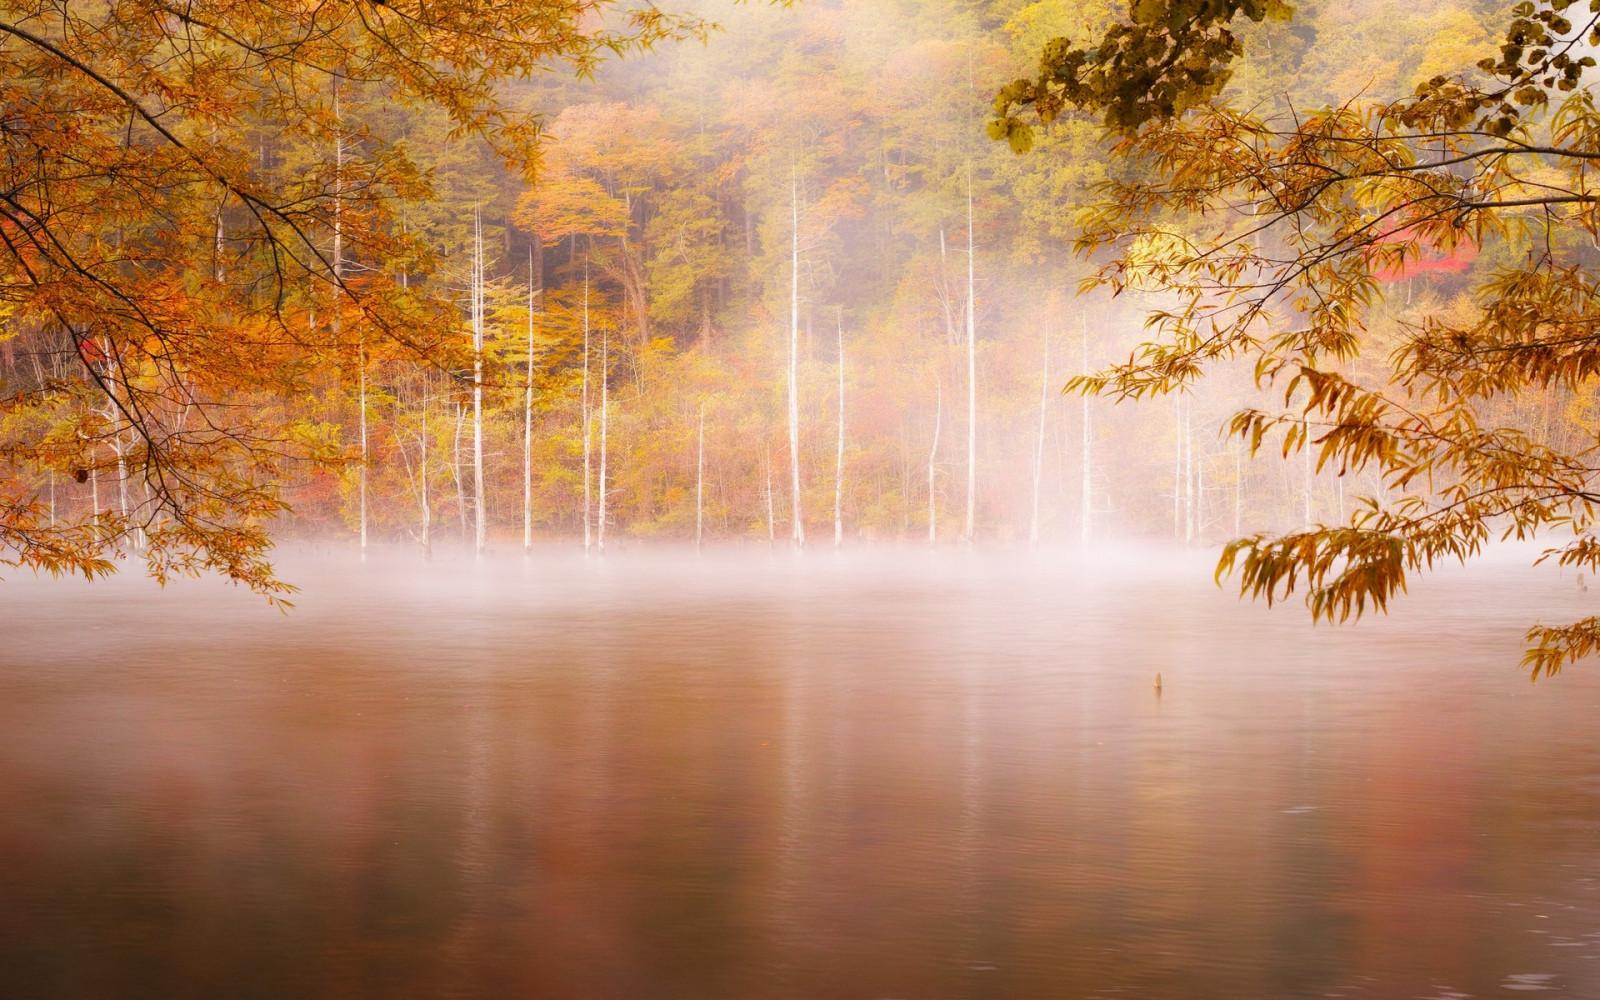 Юбилей, осеннее утро в лесу картинки